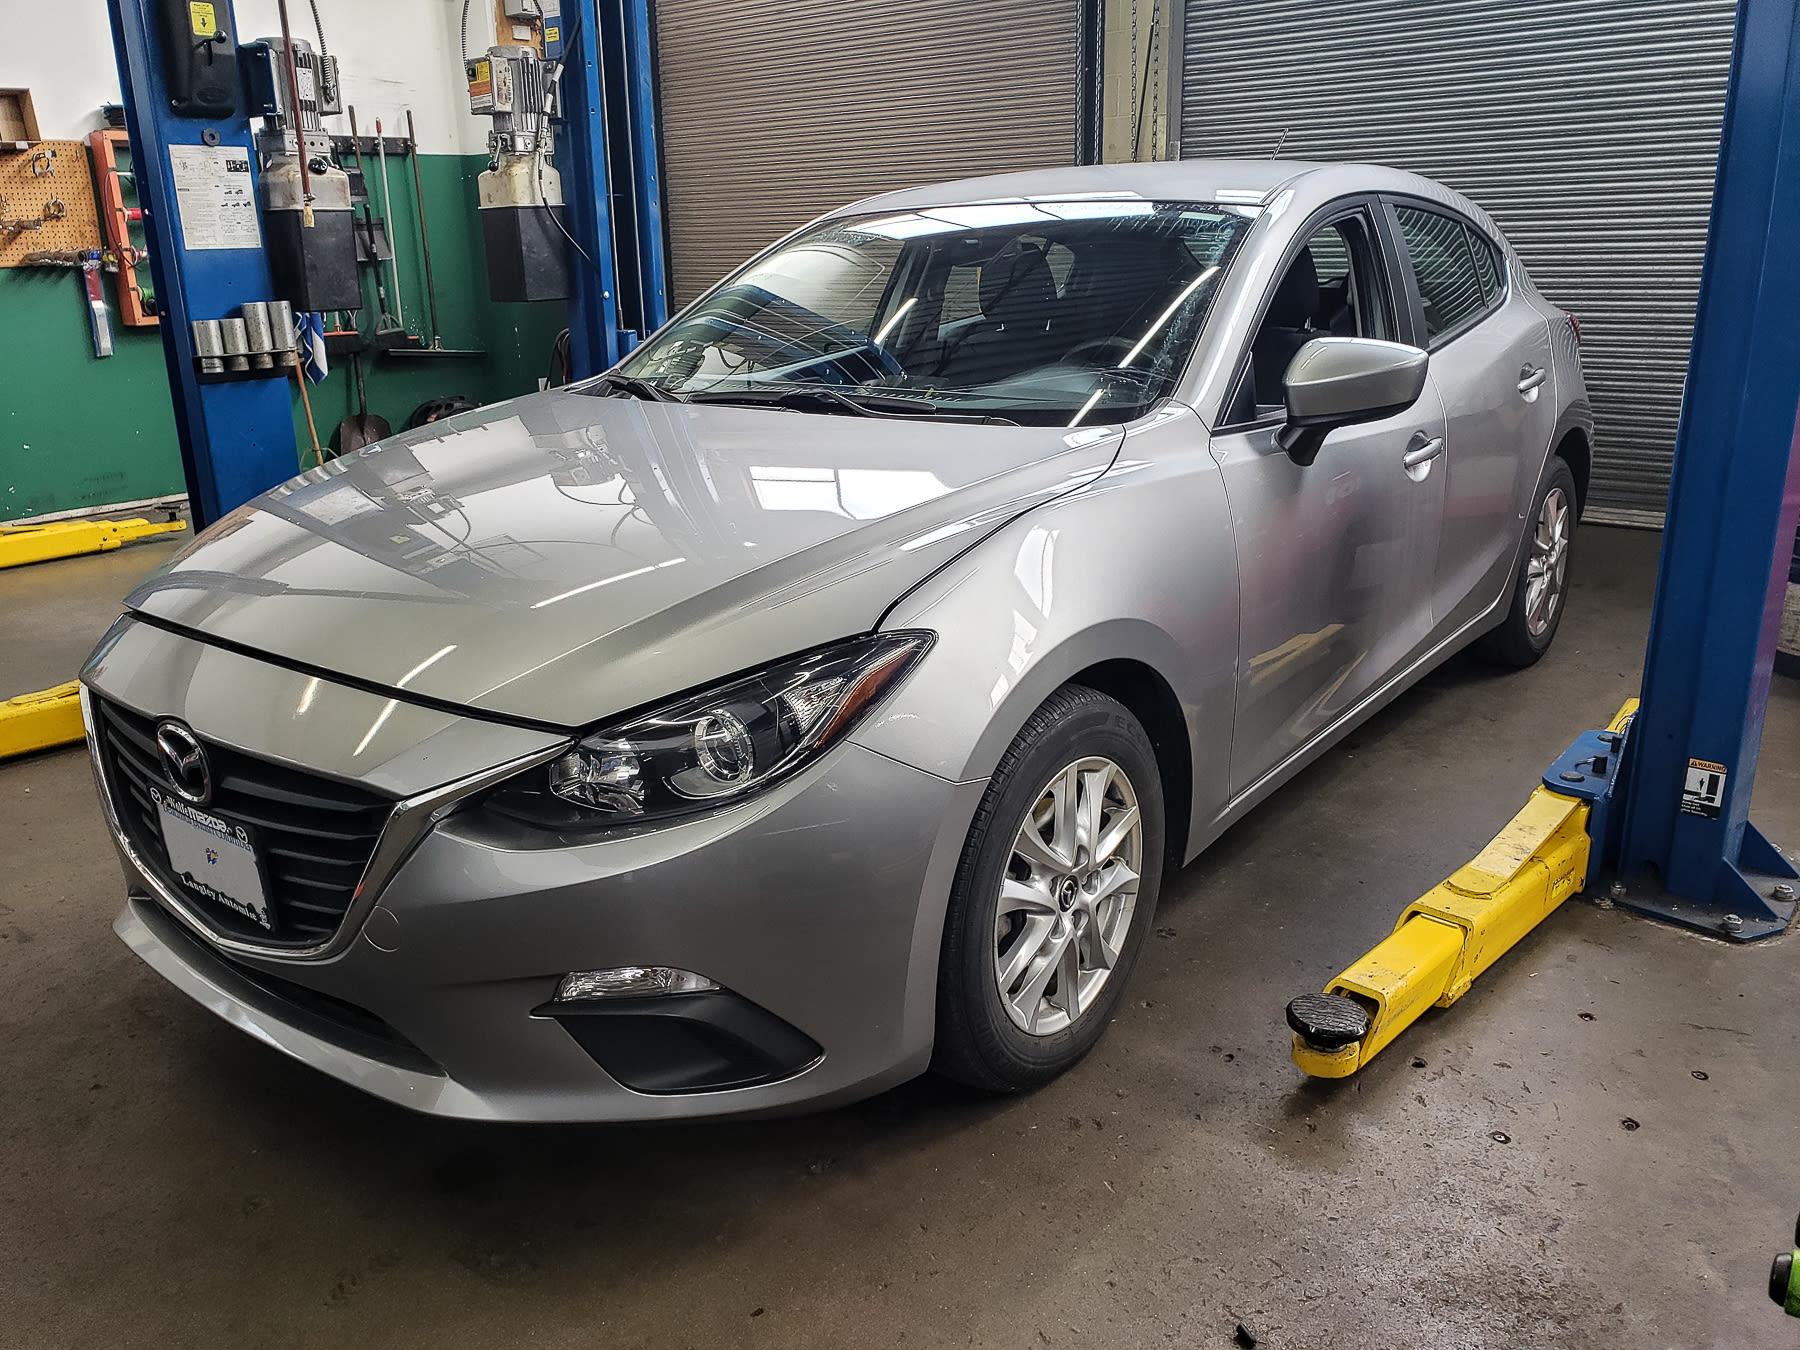 2015 Mazda 3 - Electrical Issues- Pawlik Automotive Repair ...